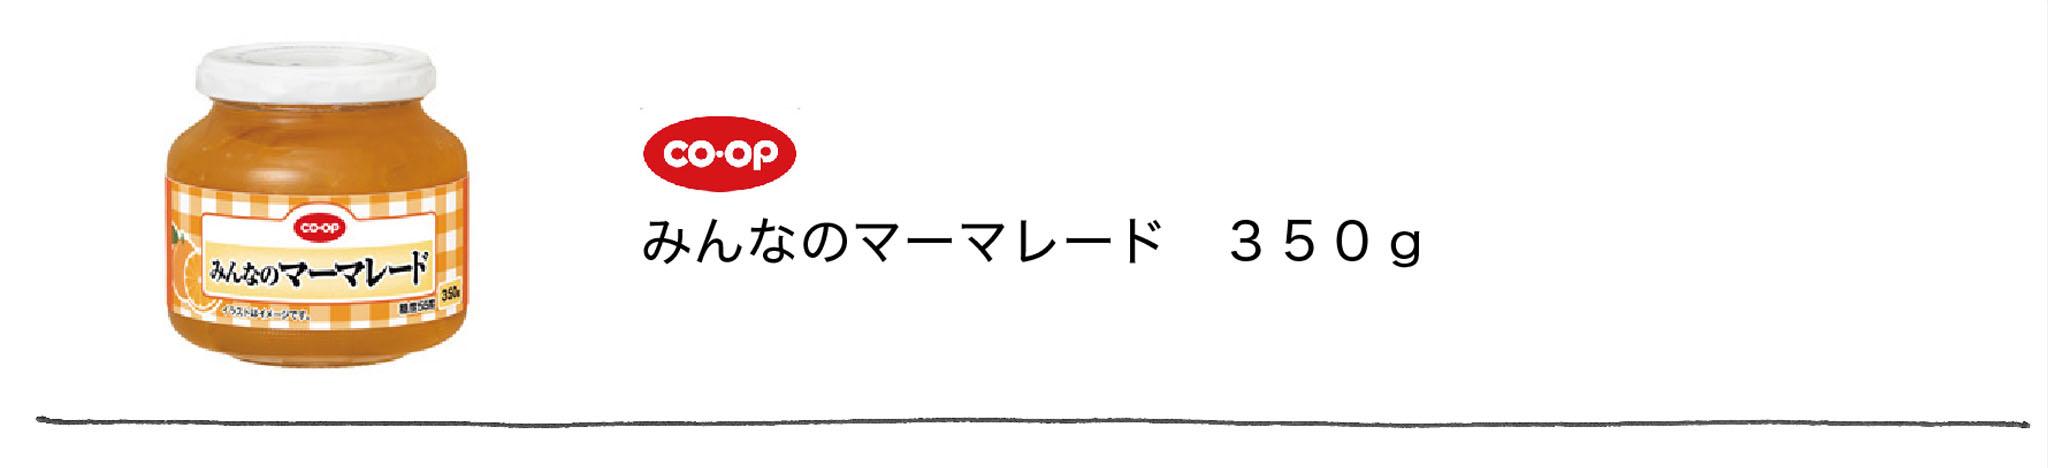 natuoyasu_g.jpg